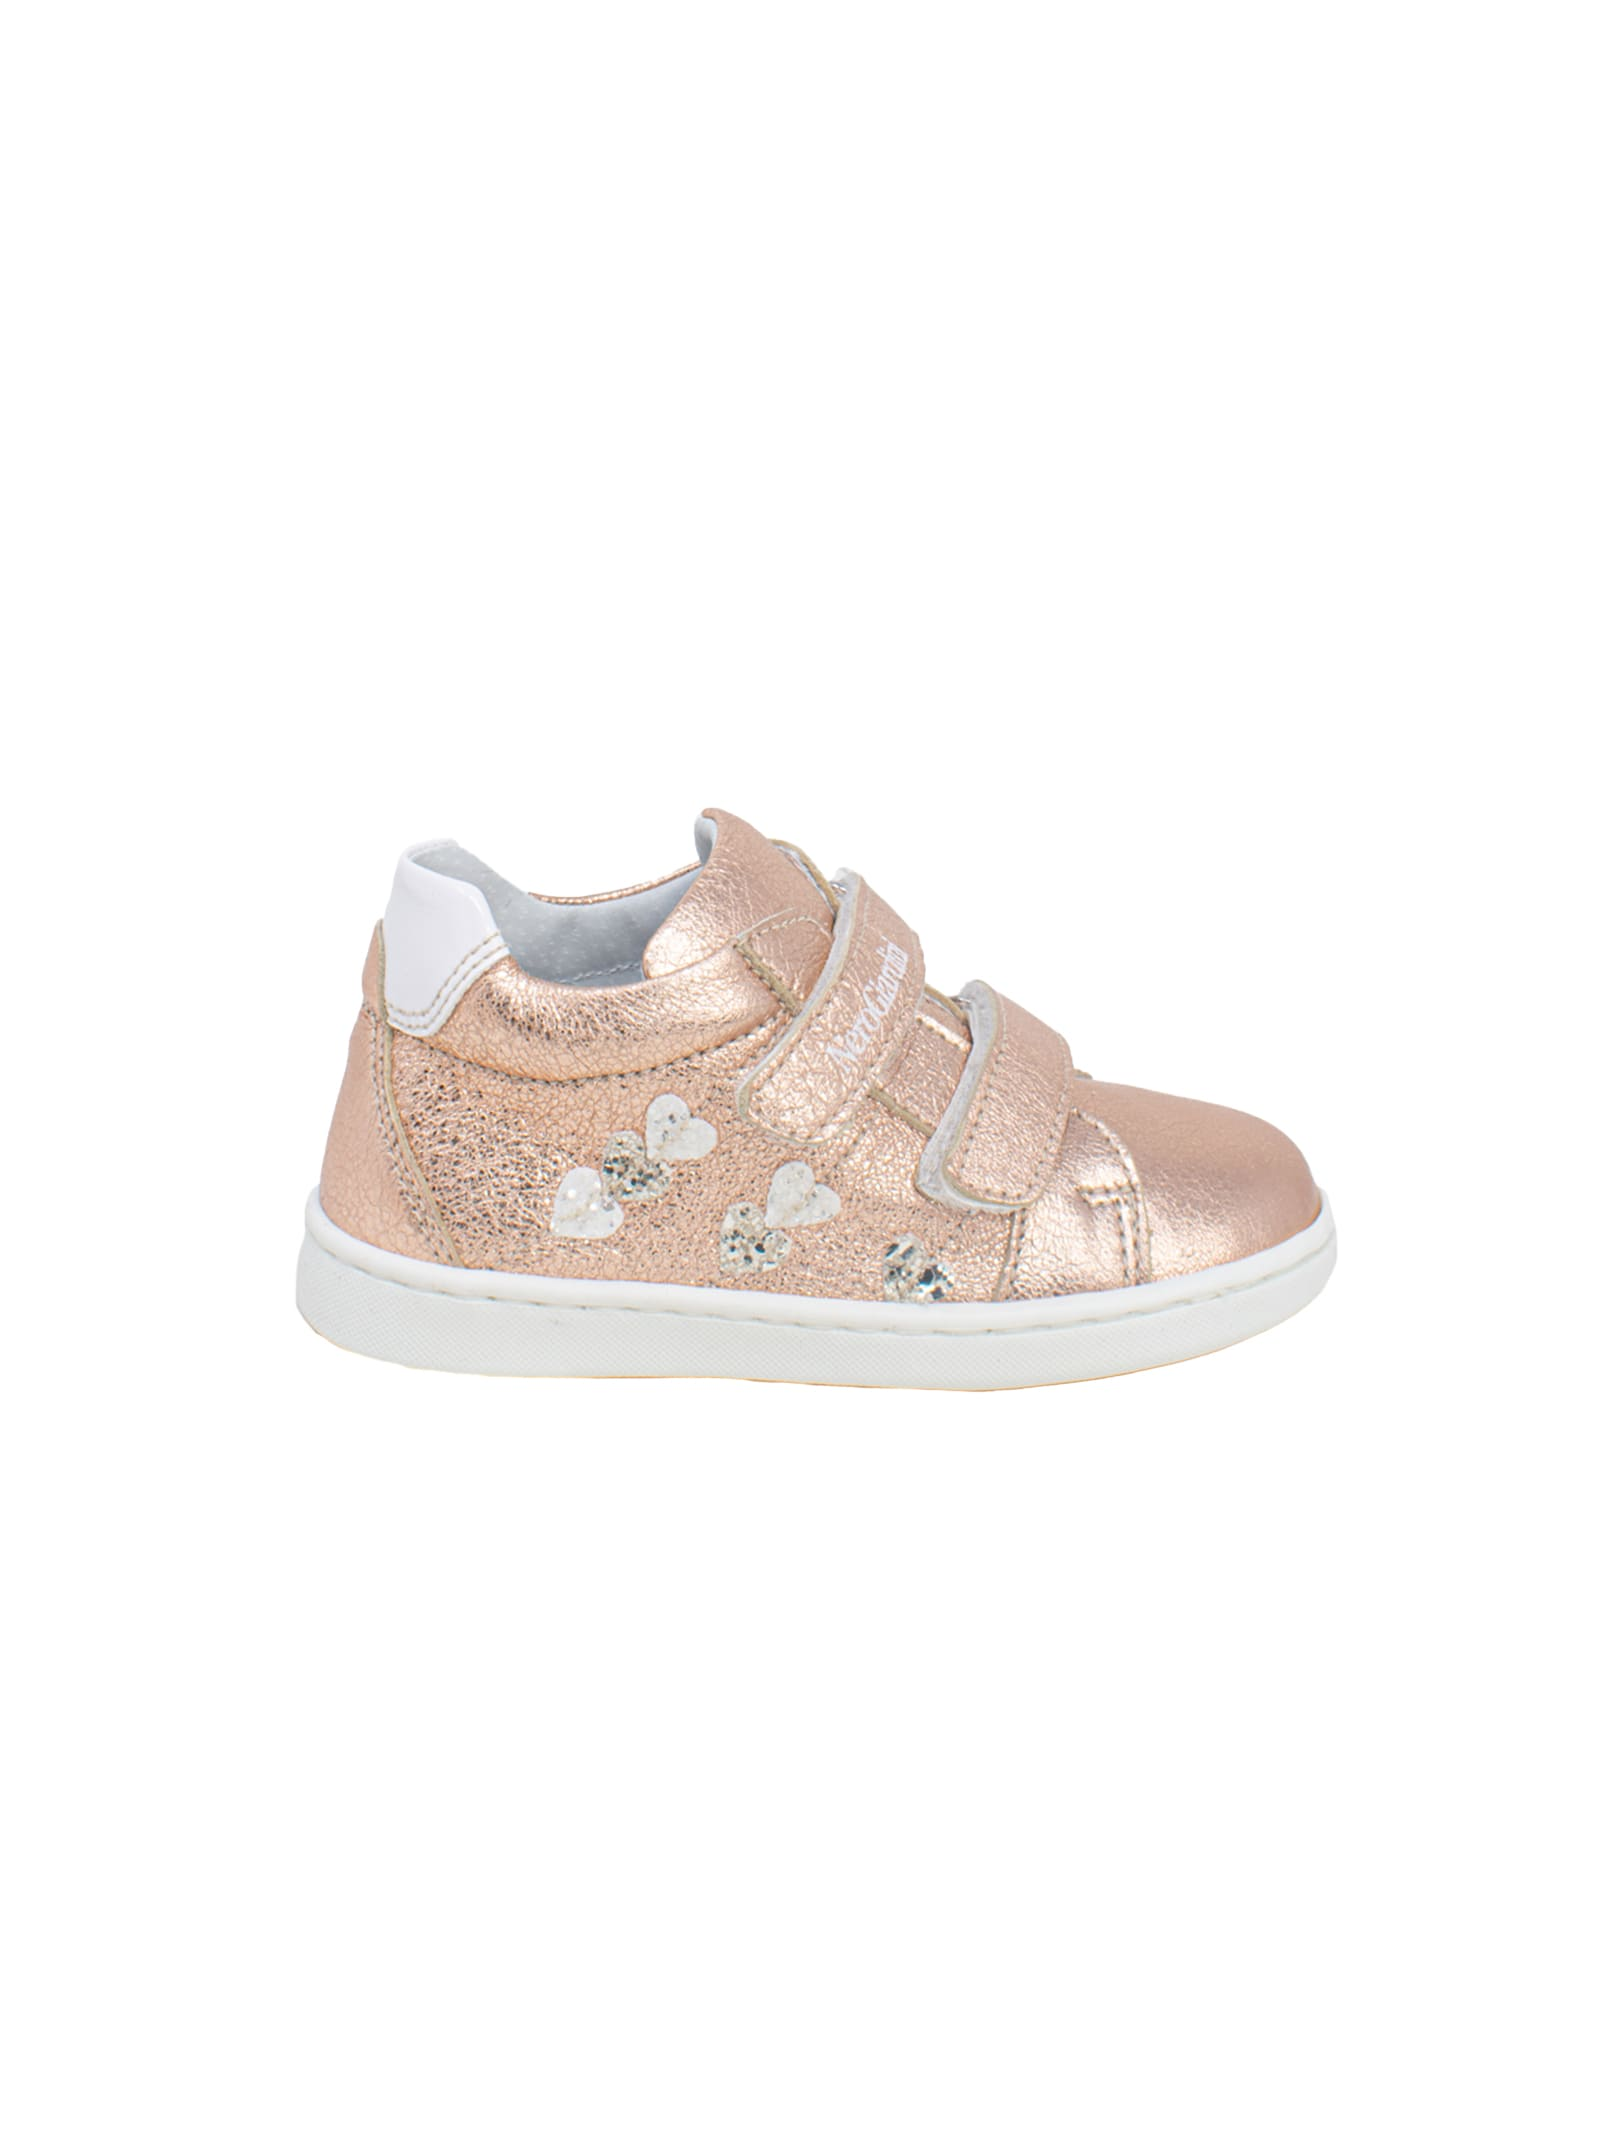 Sneakers Bambina Heart NERO GIARDINI JUNIOR | Sneakers | E118231F660